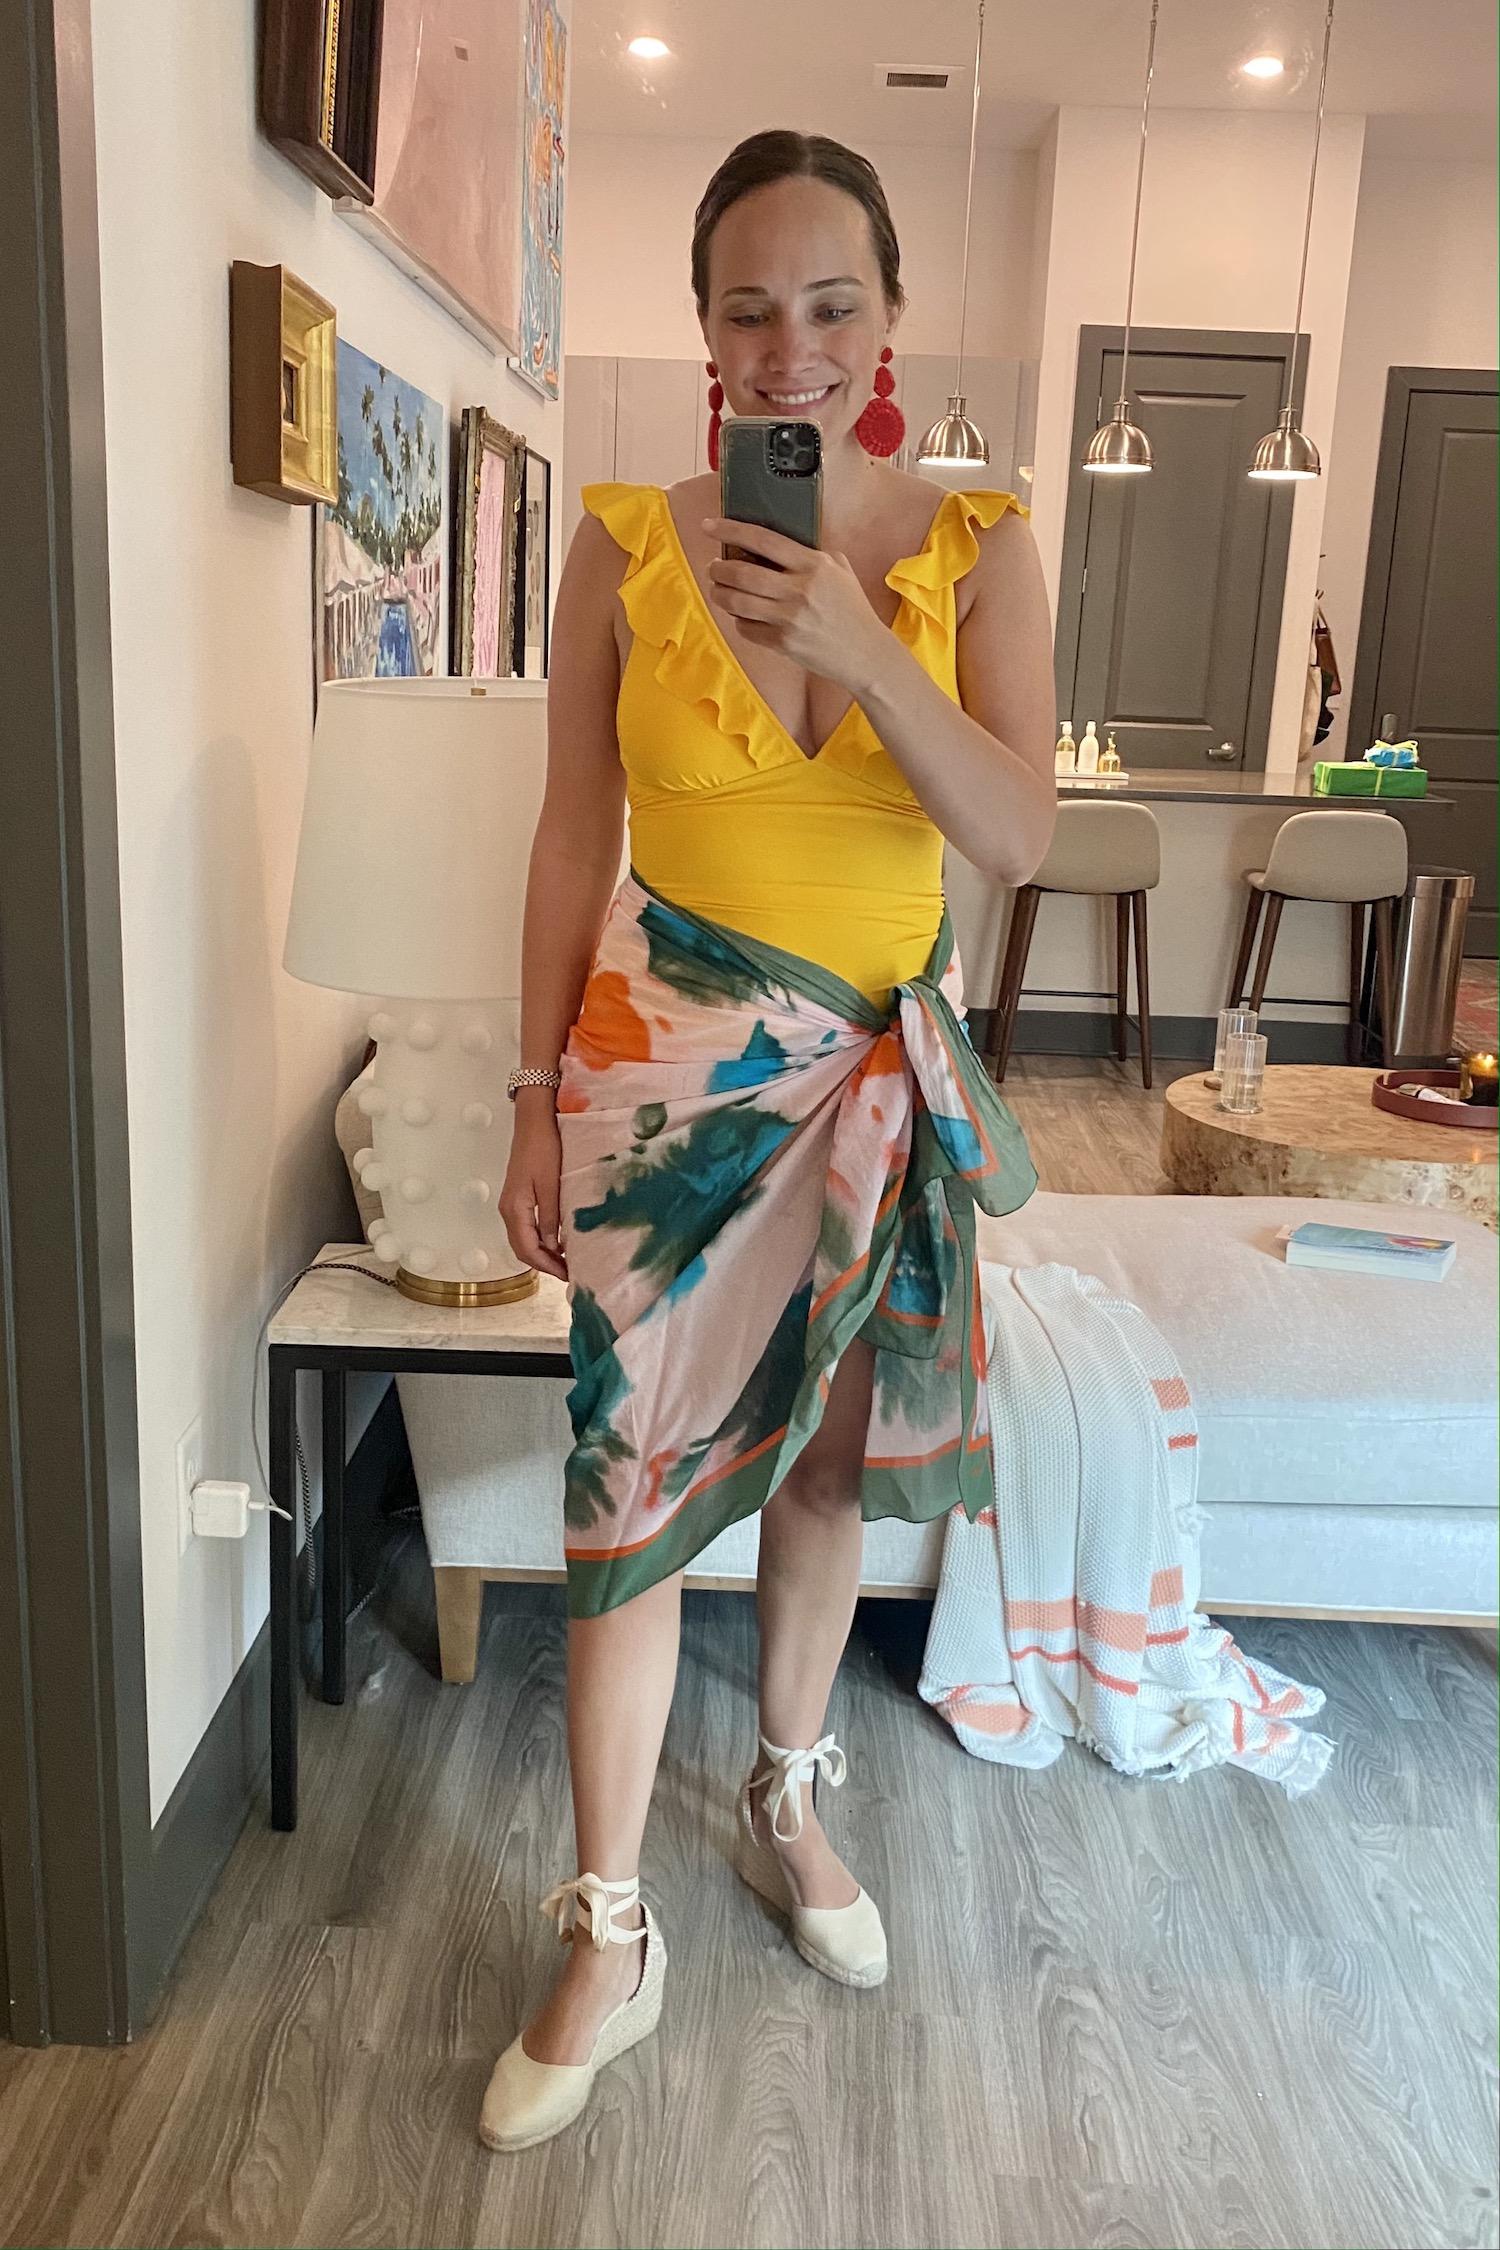 yelllow Amazon swimsuit   Everything I Wore Last Week 6.23.21